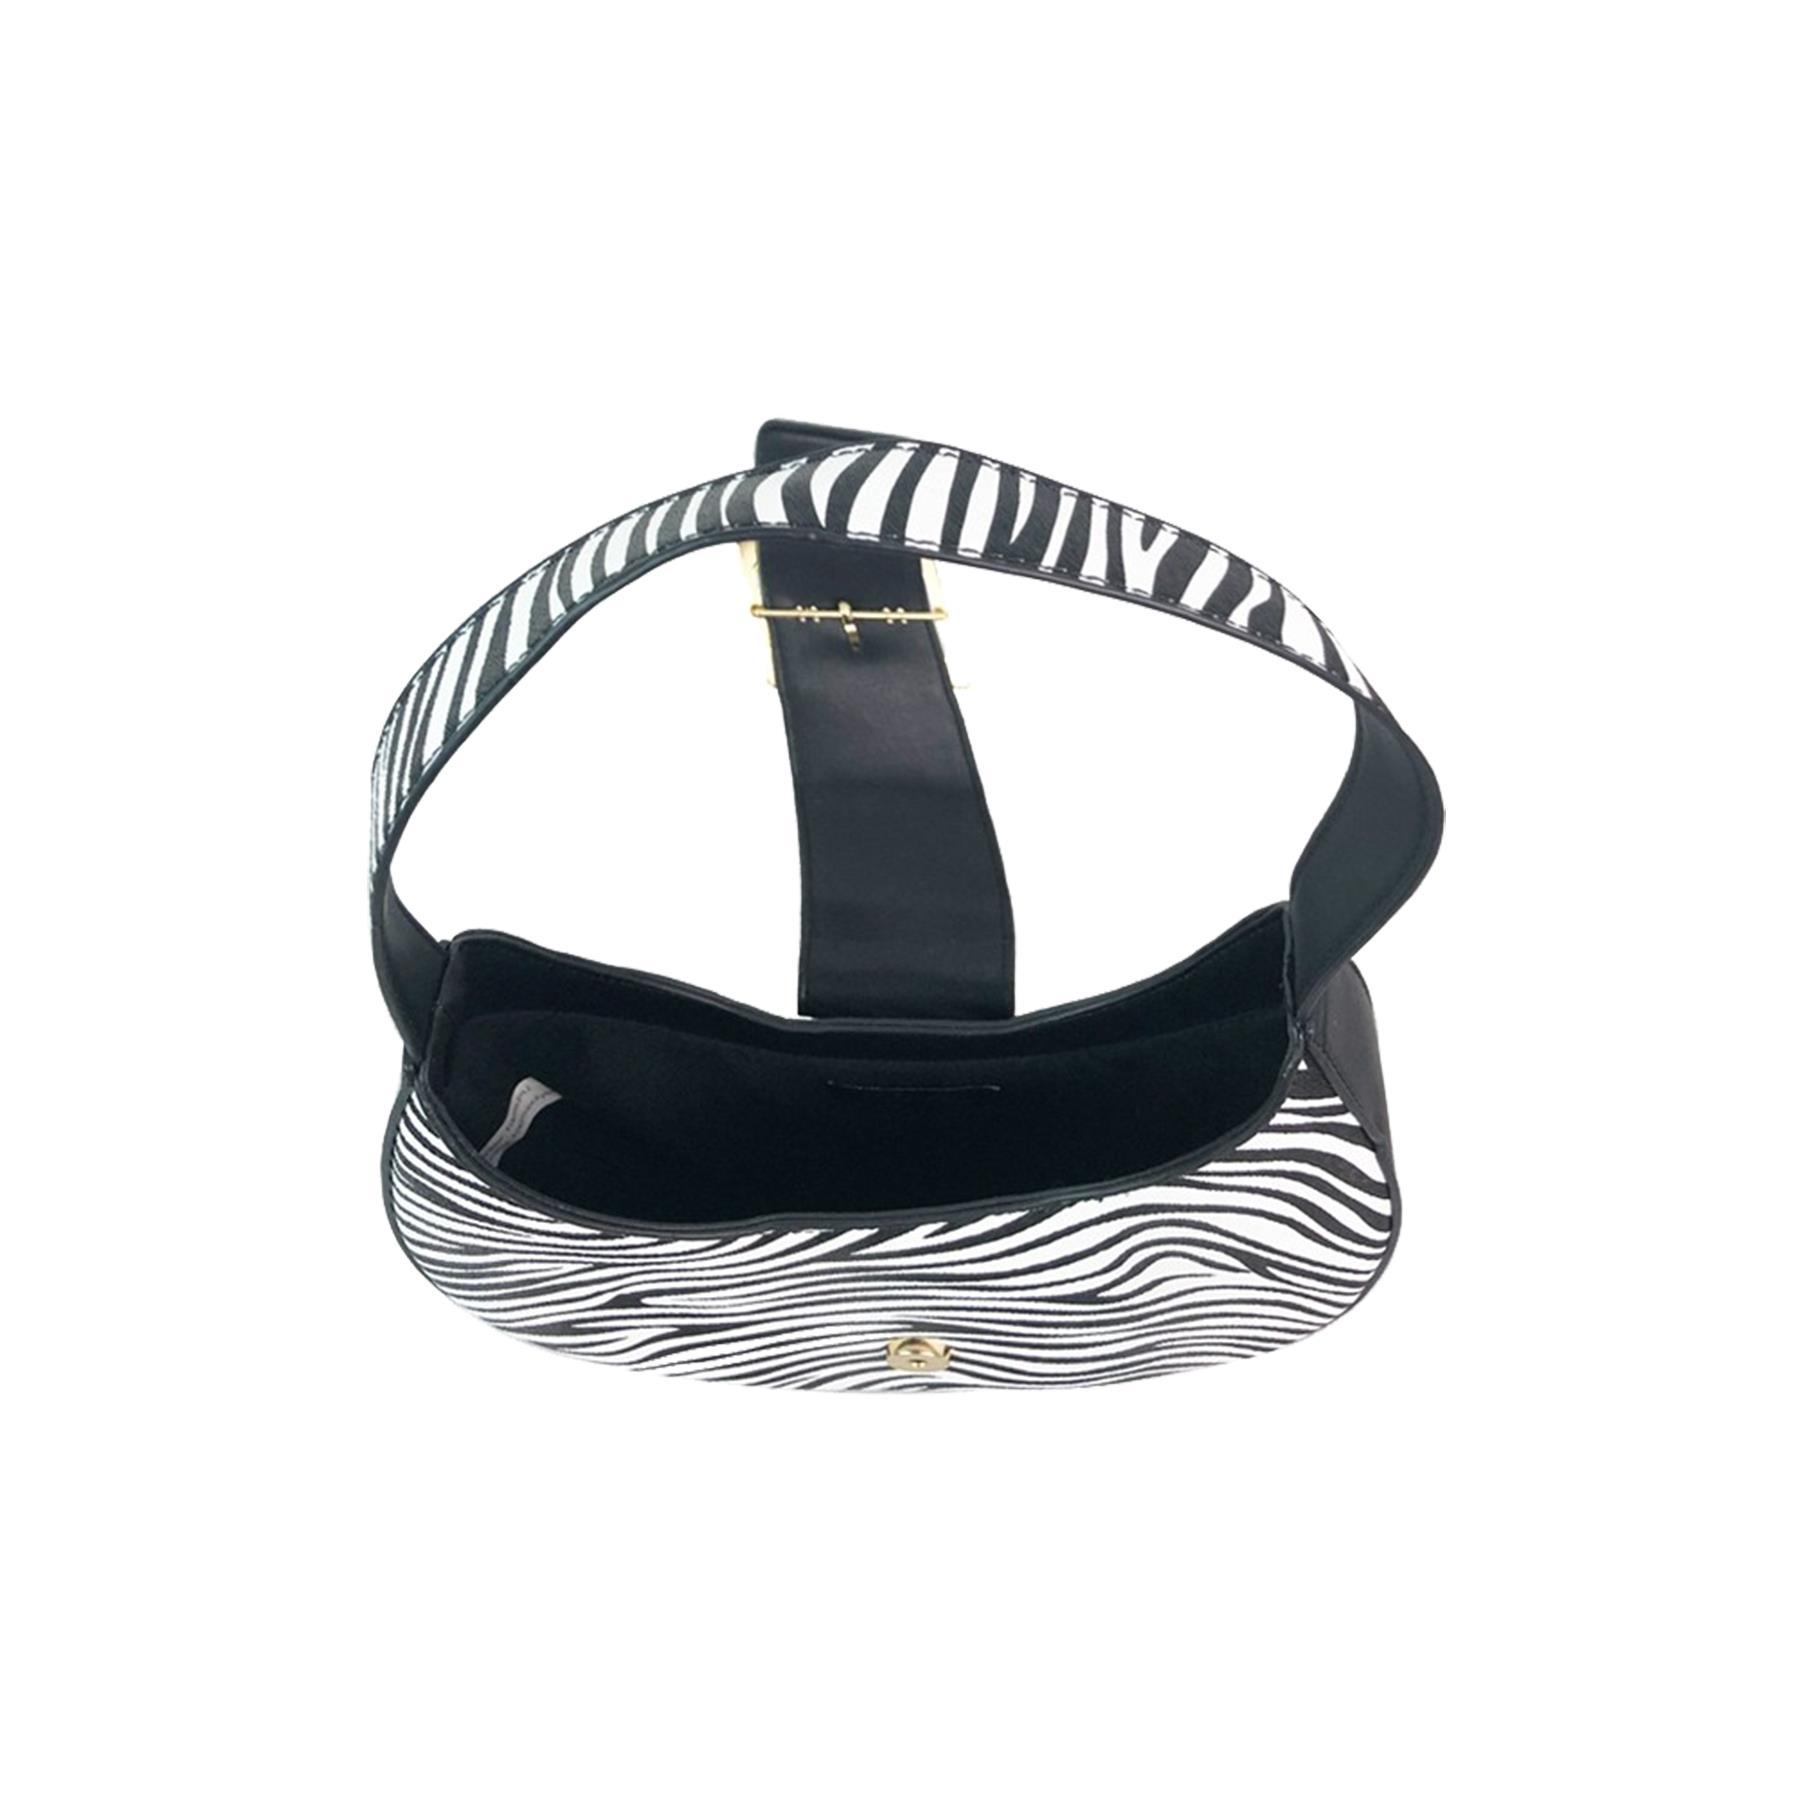 New-Women-s-Zebra-Leopard-Print-Faux-Leather-Fashion-Shoulder-Bags thumbnail 7